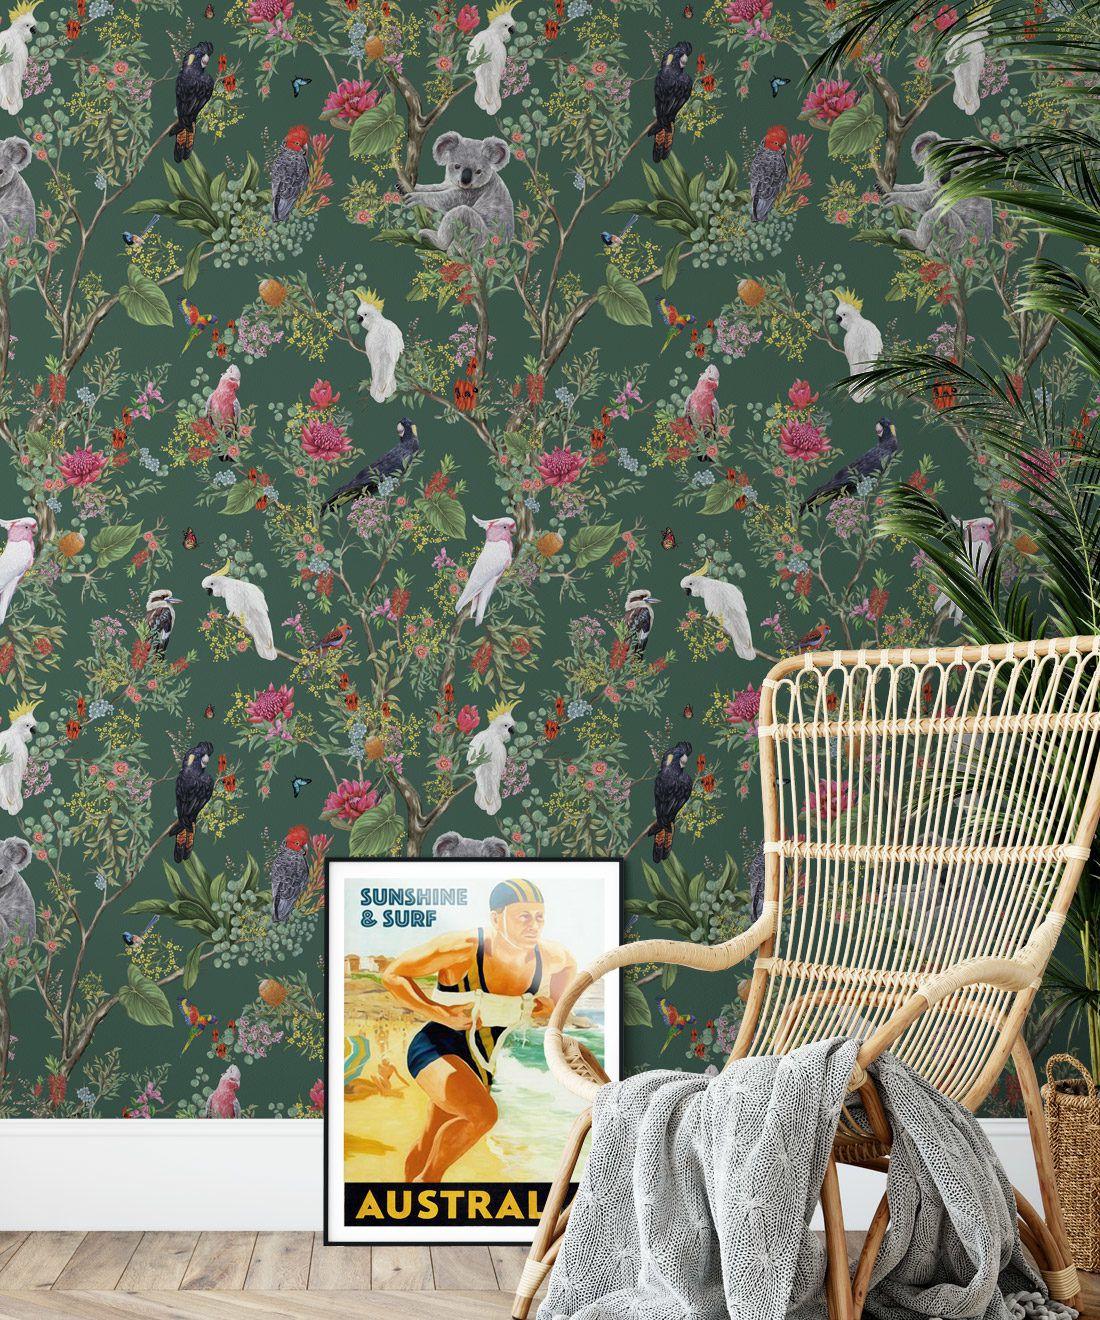 Australia Wallpaper • Cockatoos, Koalas, Parrots, Finches • Milton & King USA • Green Wallpaper Insitu